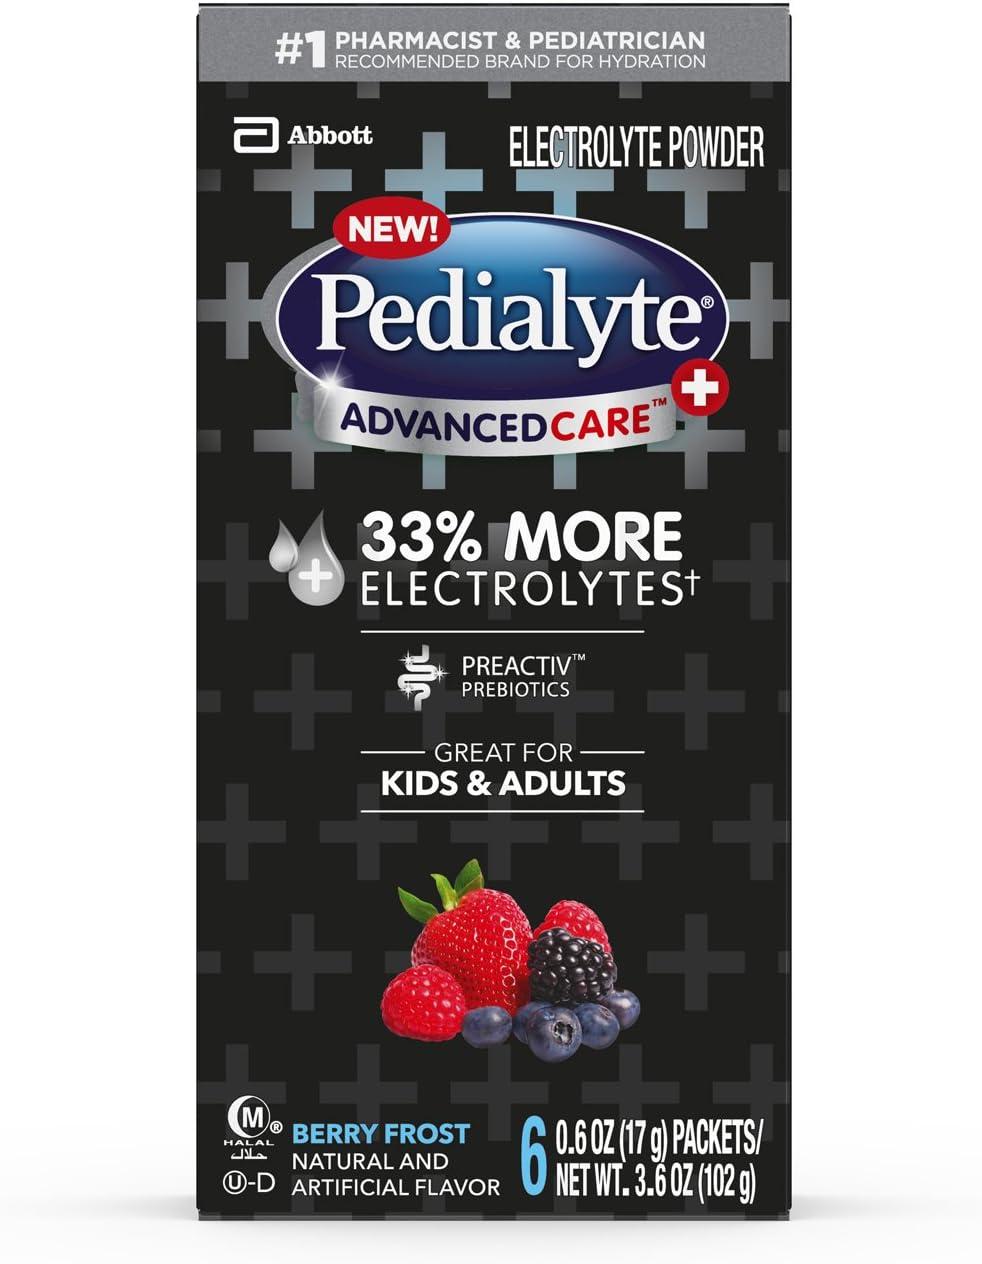 Pedialyte Advancecare Plus Powder, Berry Frost, 3.6 Oz